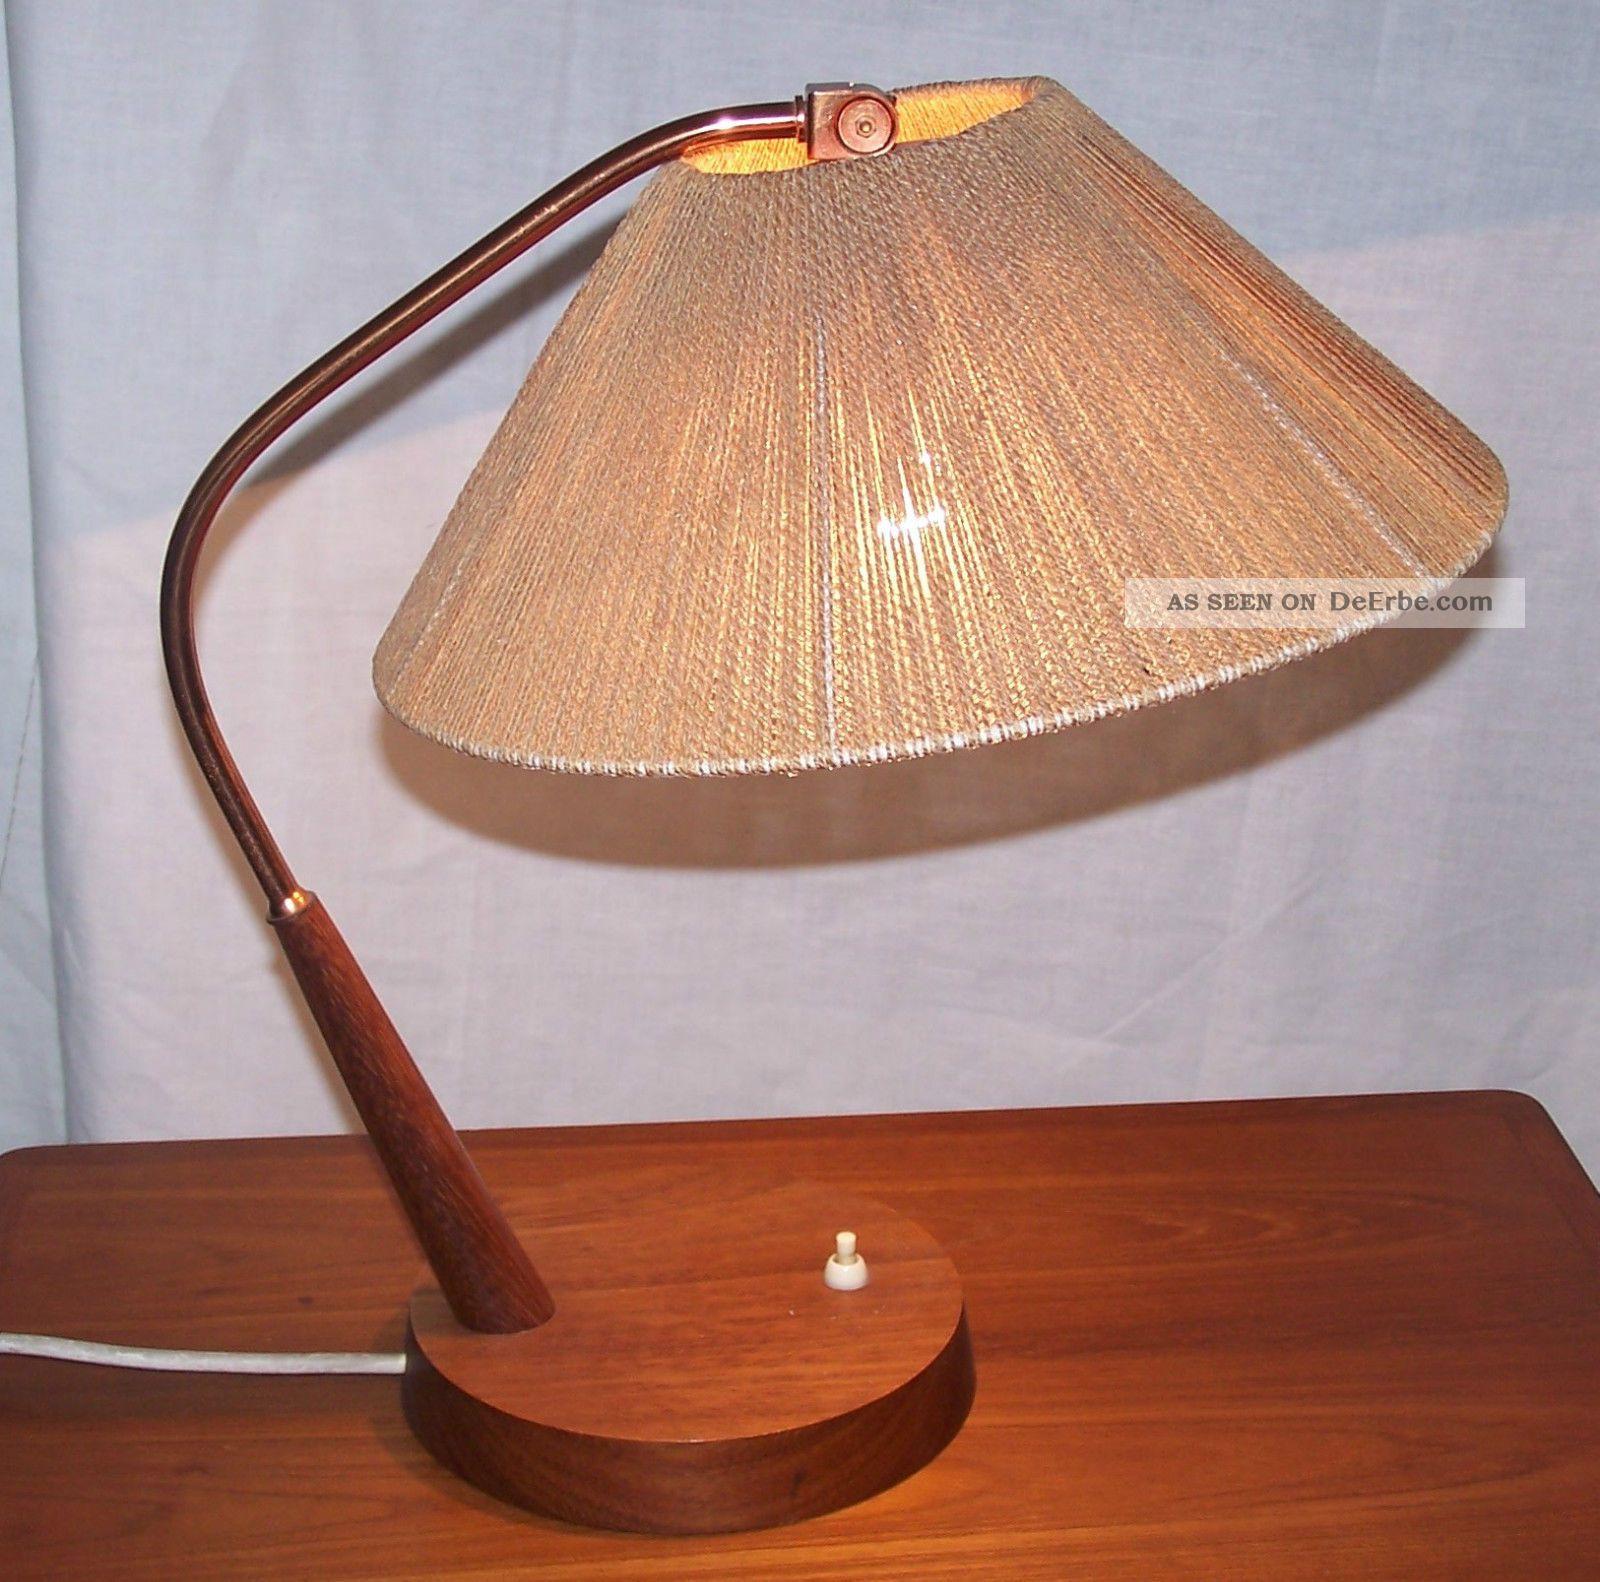 kupferlampe tischlampe table lamp temde typ 33 teakholz jacobsen aera danish. Black Bedroom Furniture Sets. Home Design Ideas